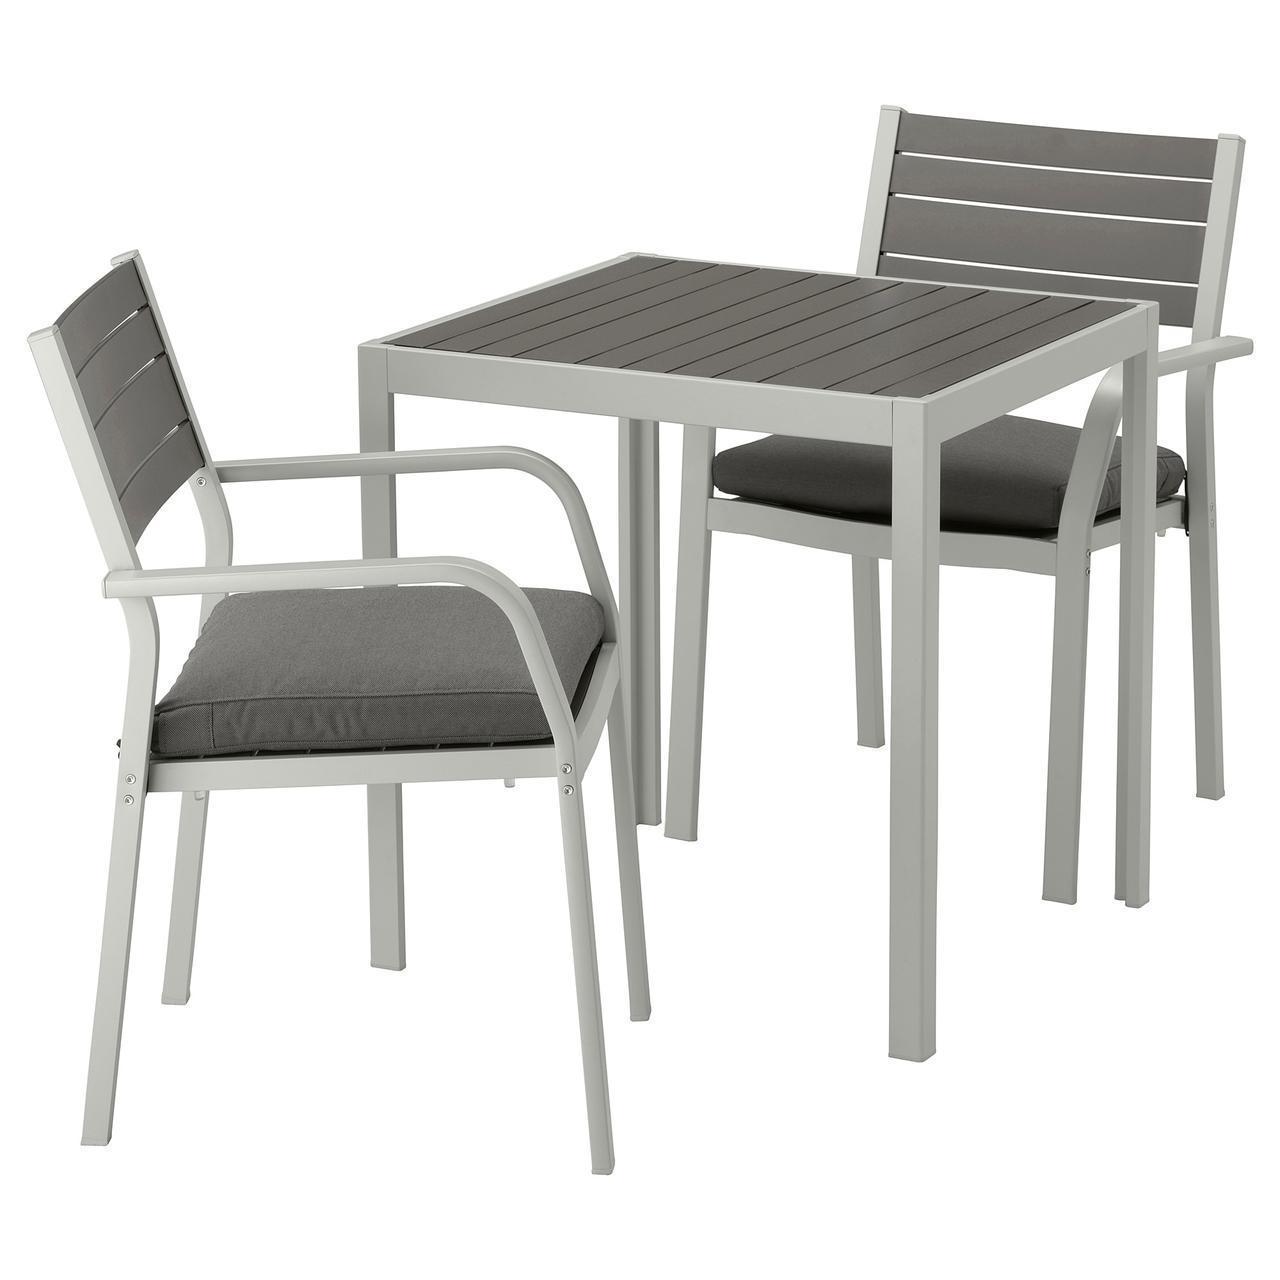 IKEA SJALLAND Садовый стол и 2 стула, темно-серый, Фрезен/дувхолмен темно-серый  (792.652.19)